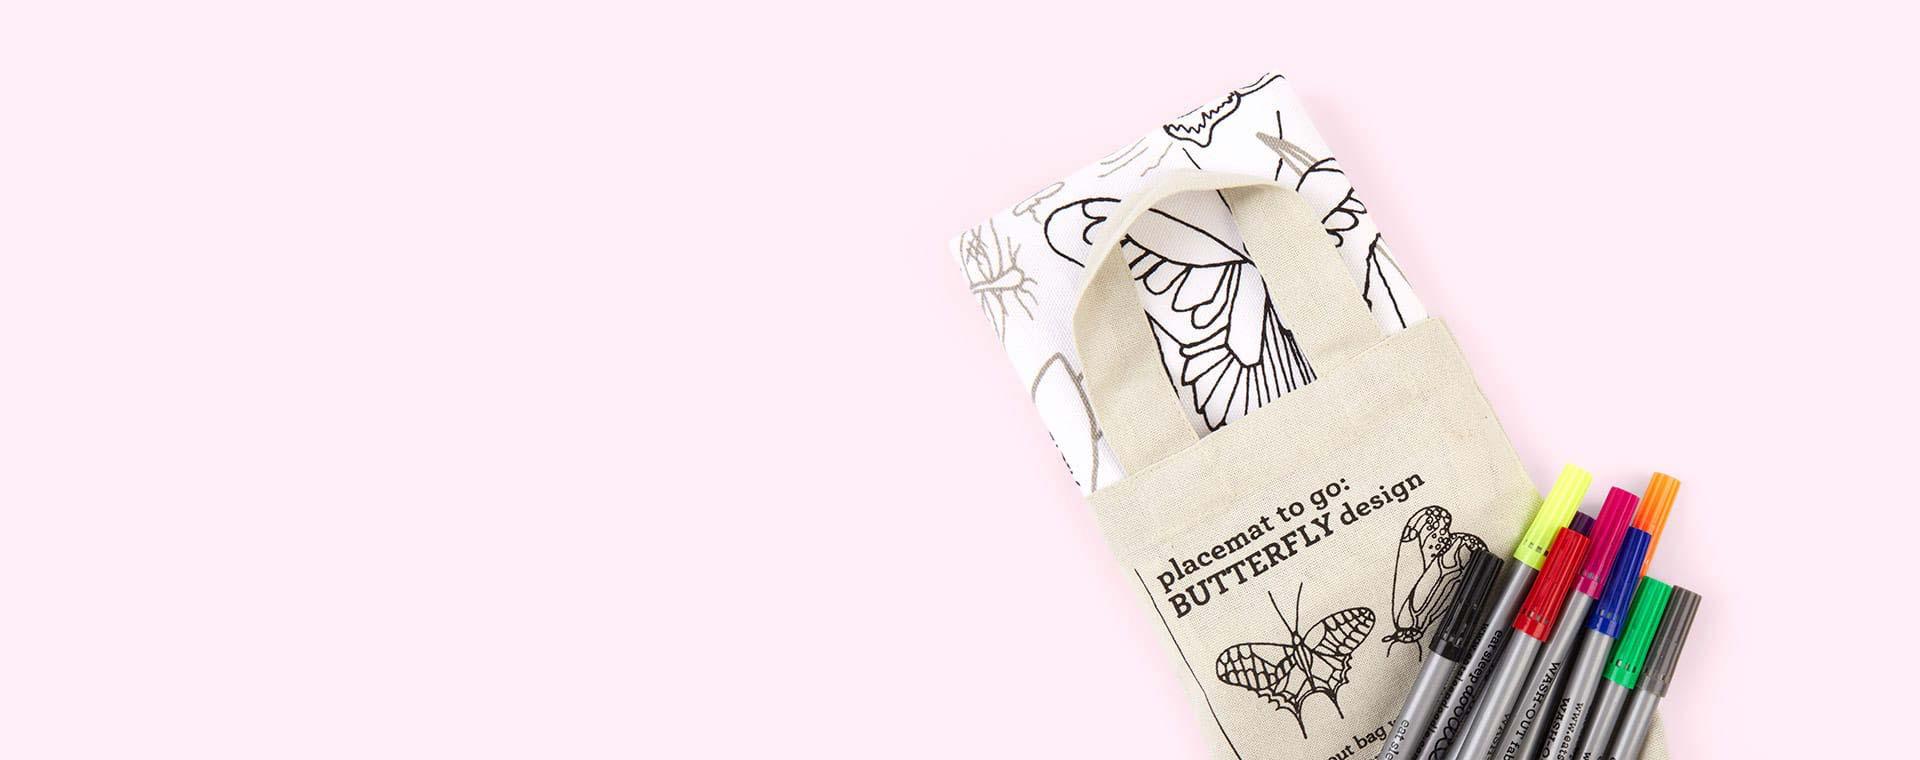 Butterflies Eat Sleep Doodle Doodle Placemat to Go